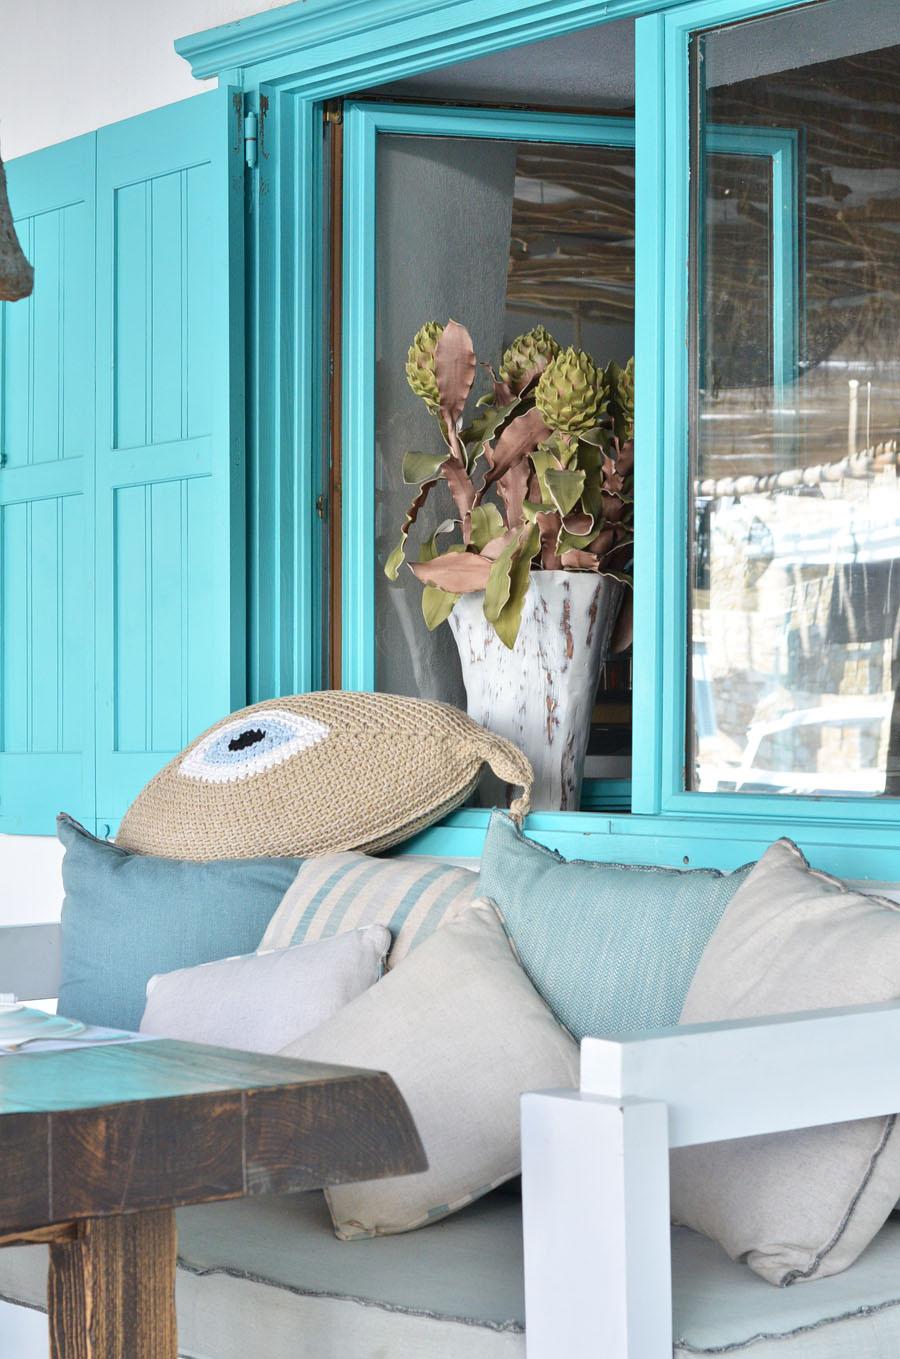 restaurant, Mykonos, Greece / Stasha Travel and Fashion Blog - self portrait